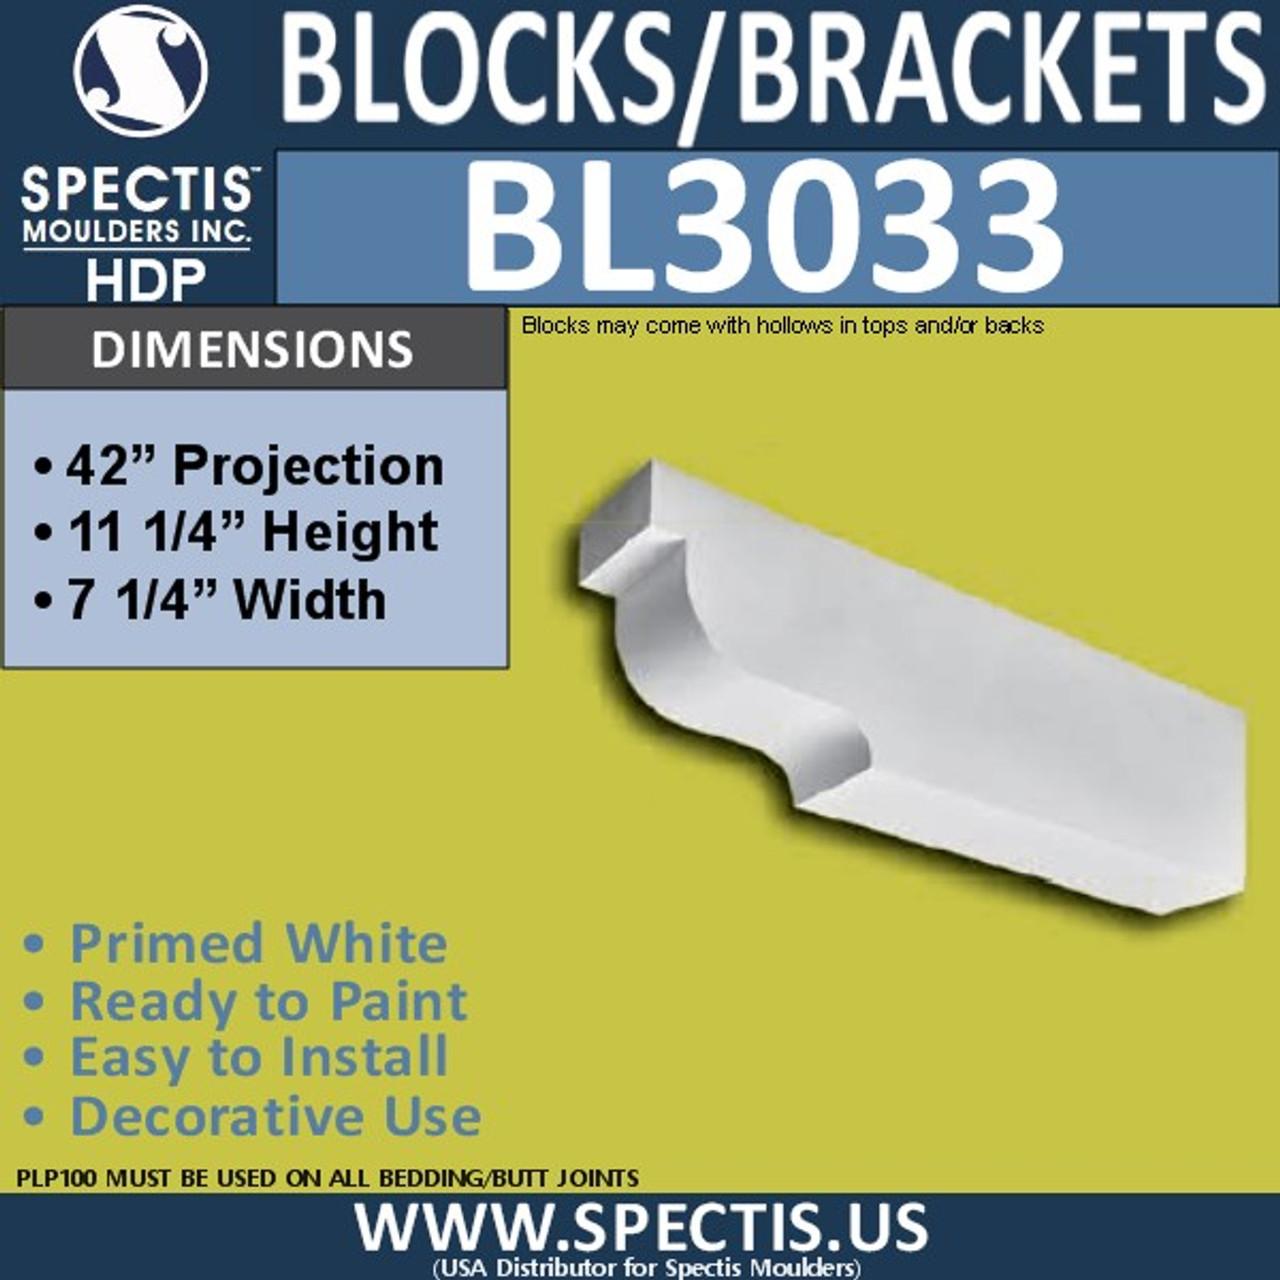 "BL3033 Eave Block or Bracket 7.25""W x 11.25""H x 42"" P"